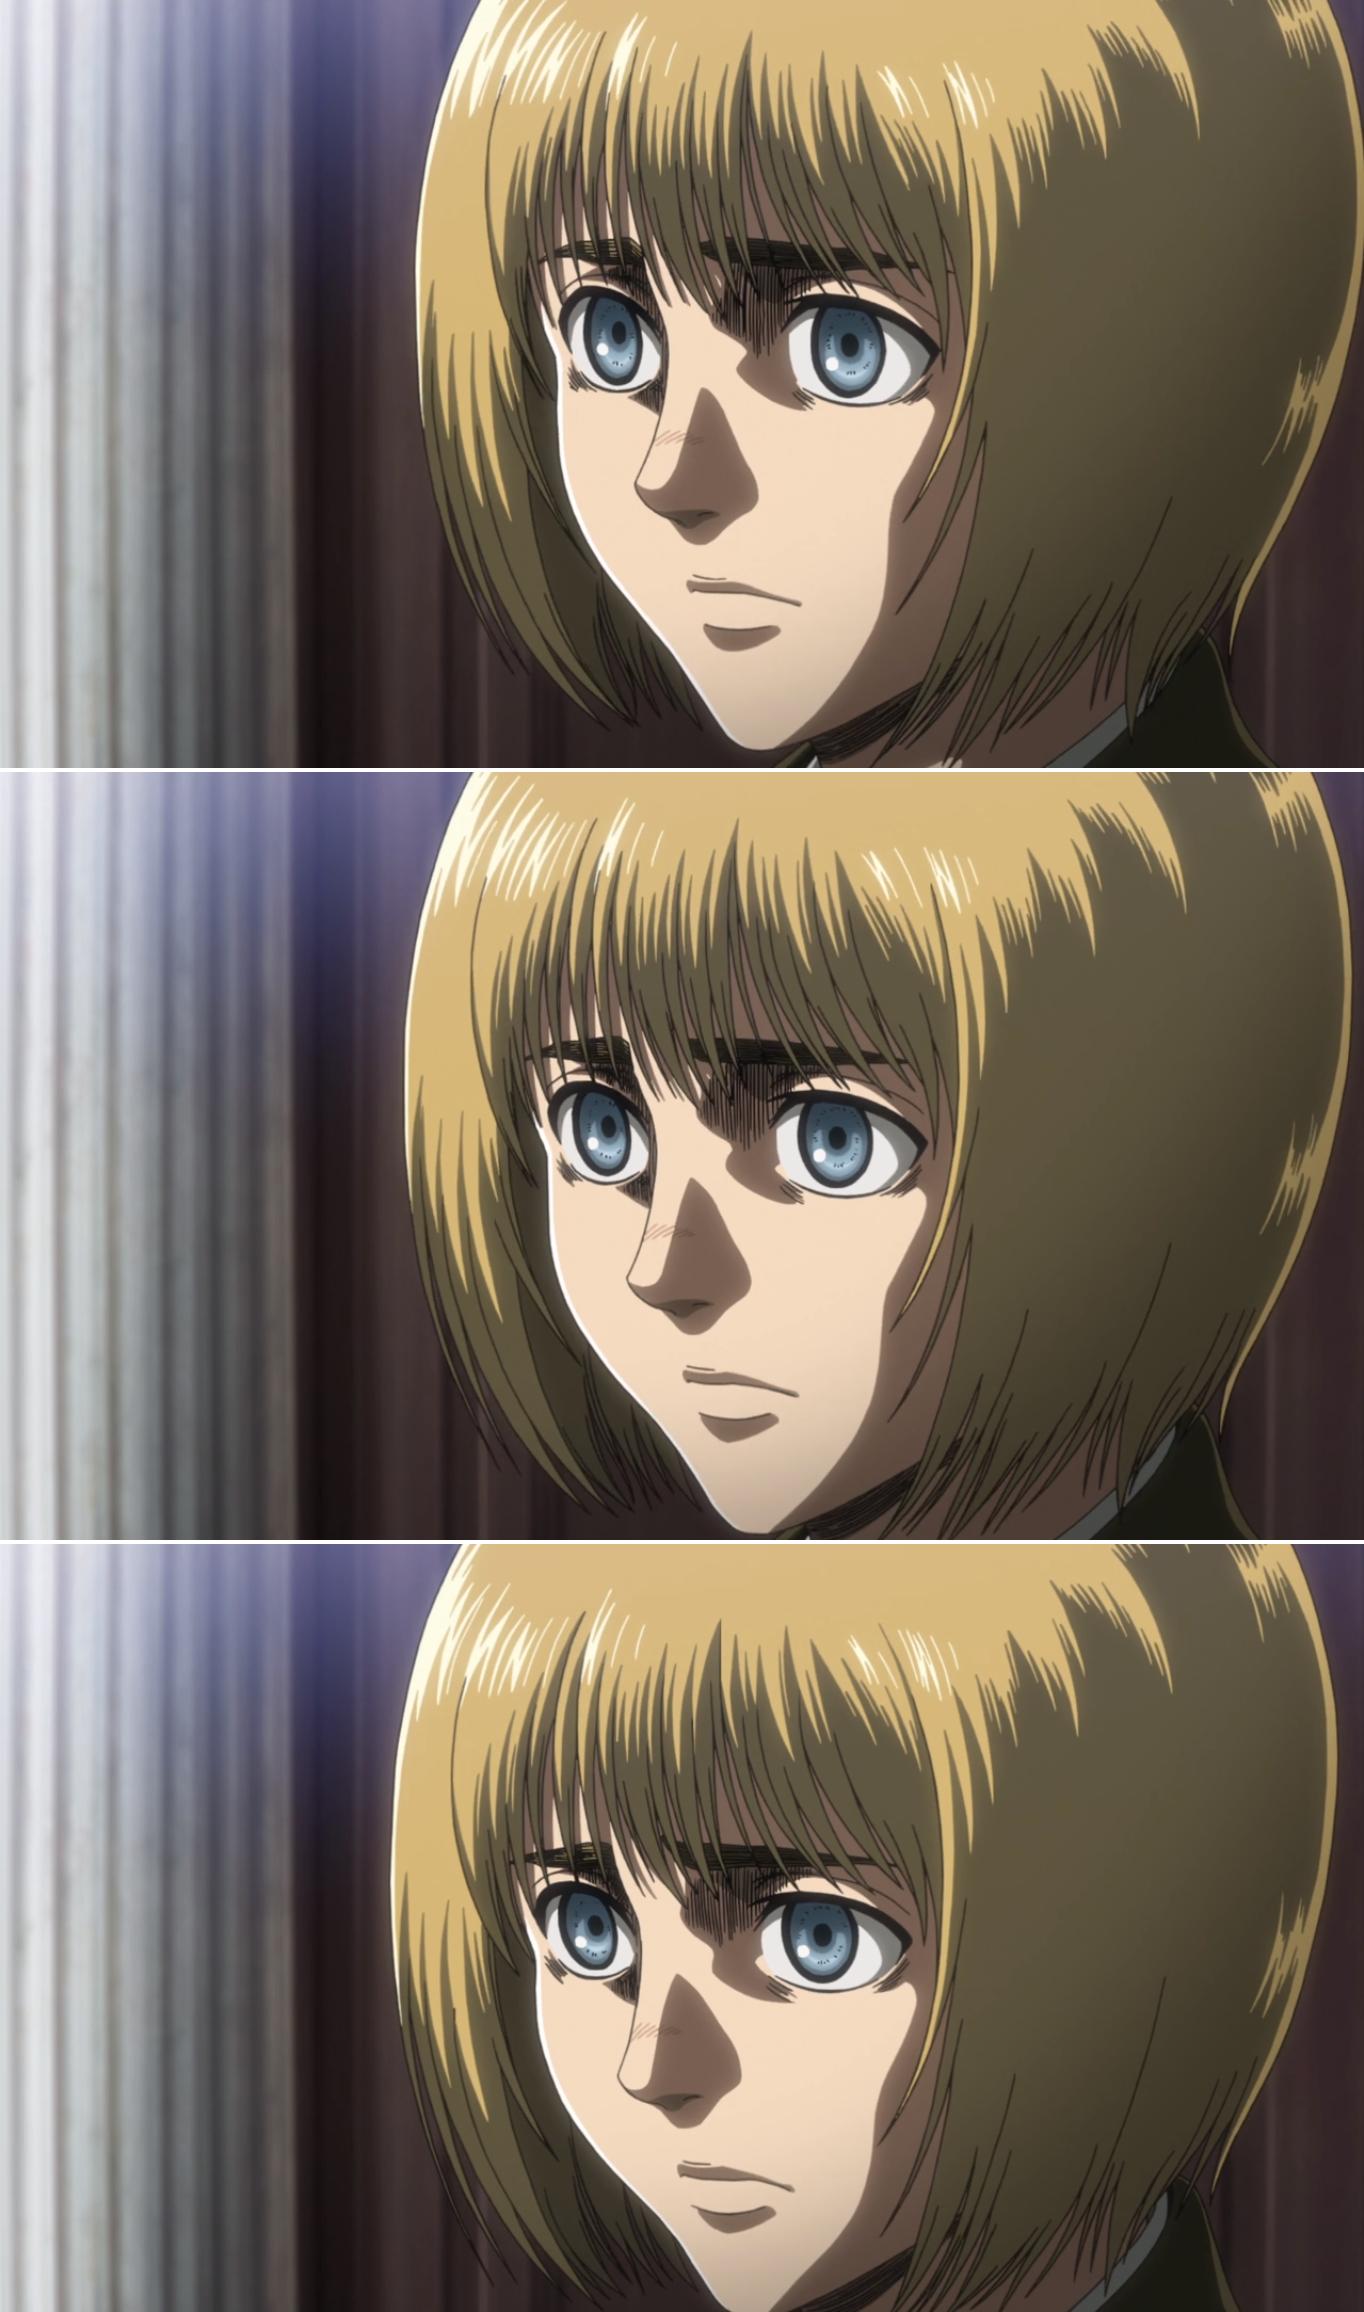 Season 3 / Armin Attack on titan, Armin, Anime